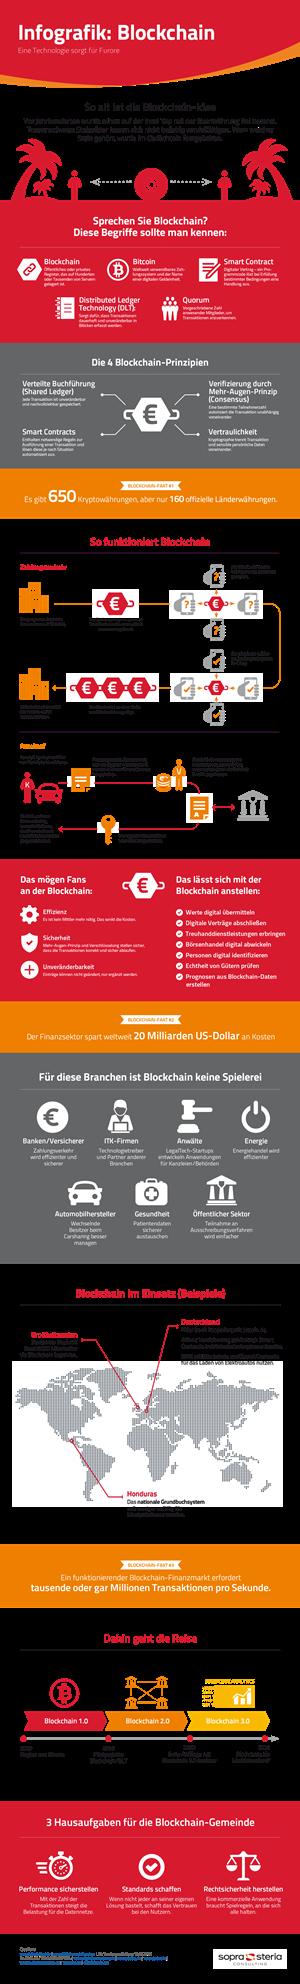 Infografik Blockchain 300x1984